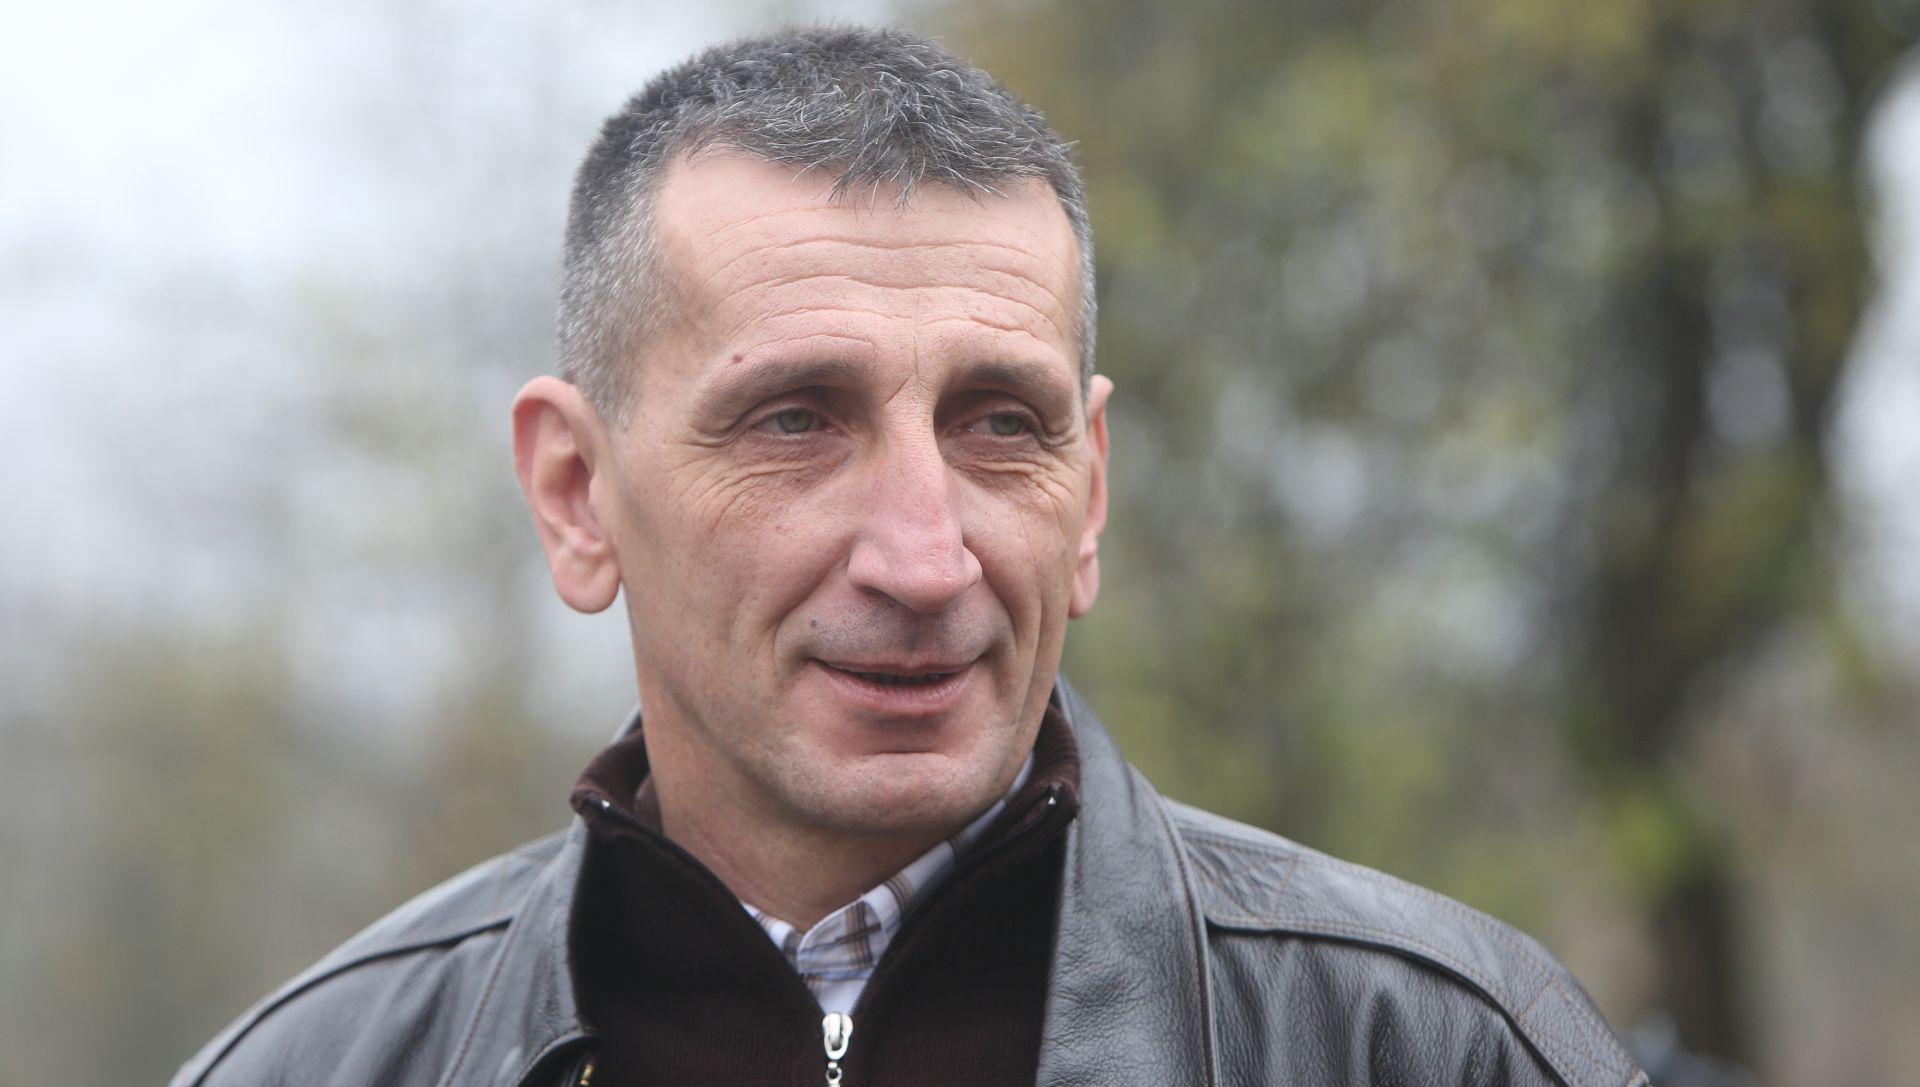 Ravnatelj HCR-a zapošljavao suprotno uputama ministra Orepića